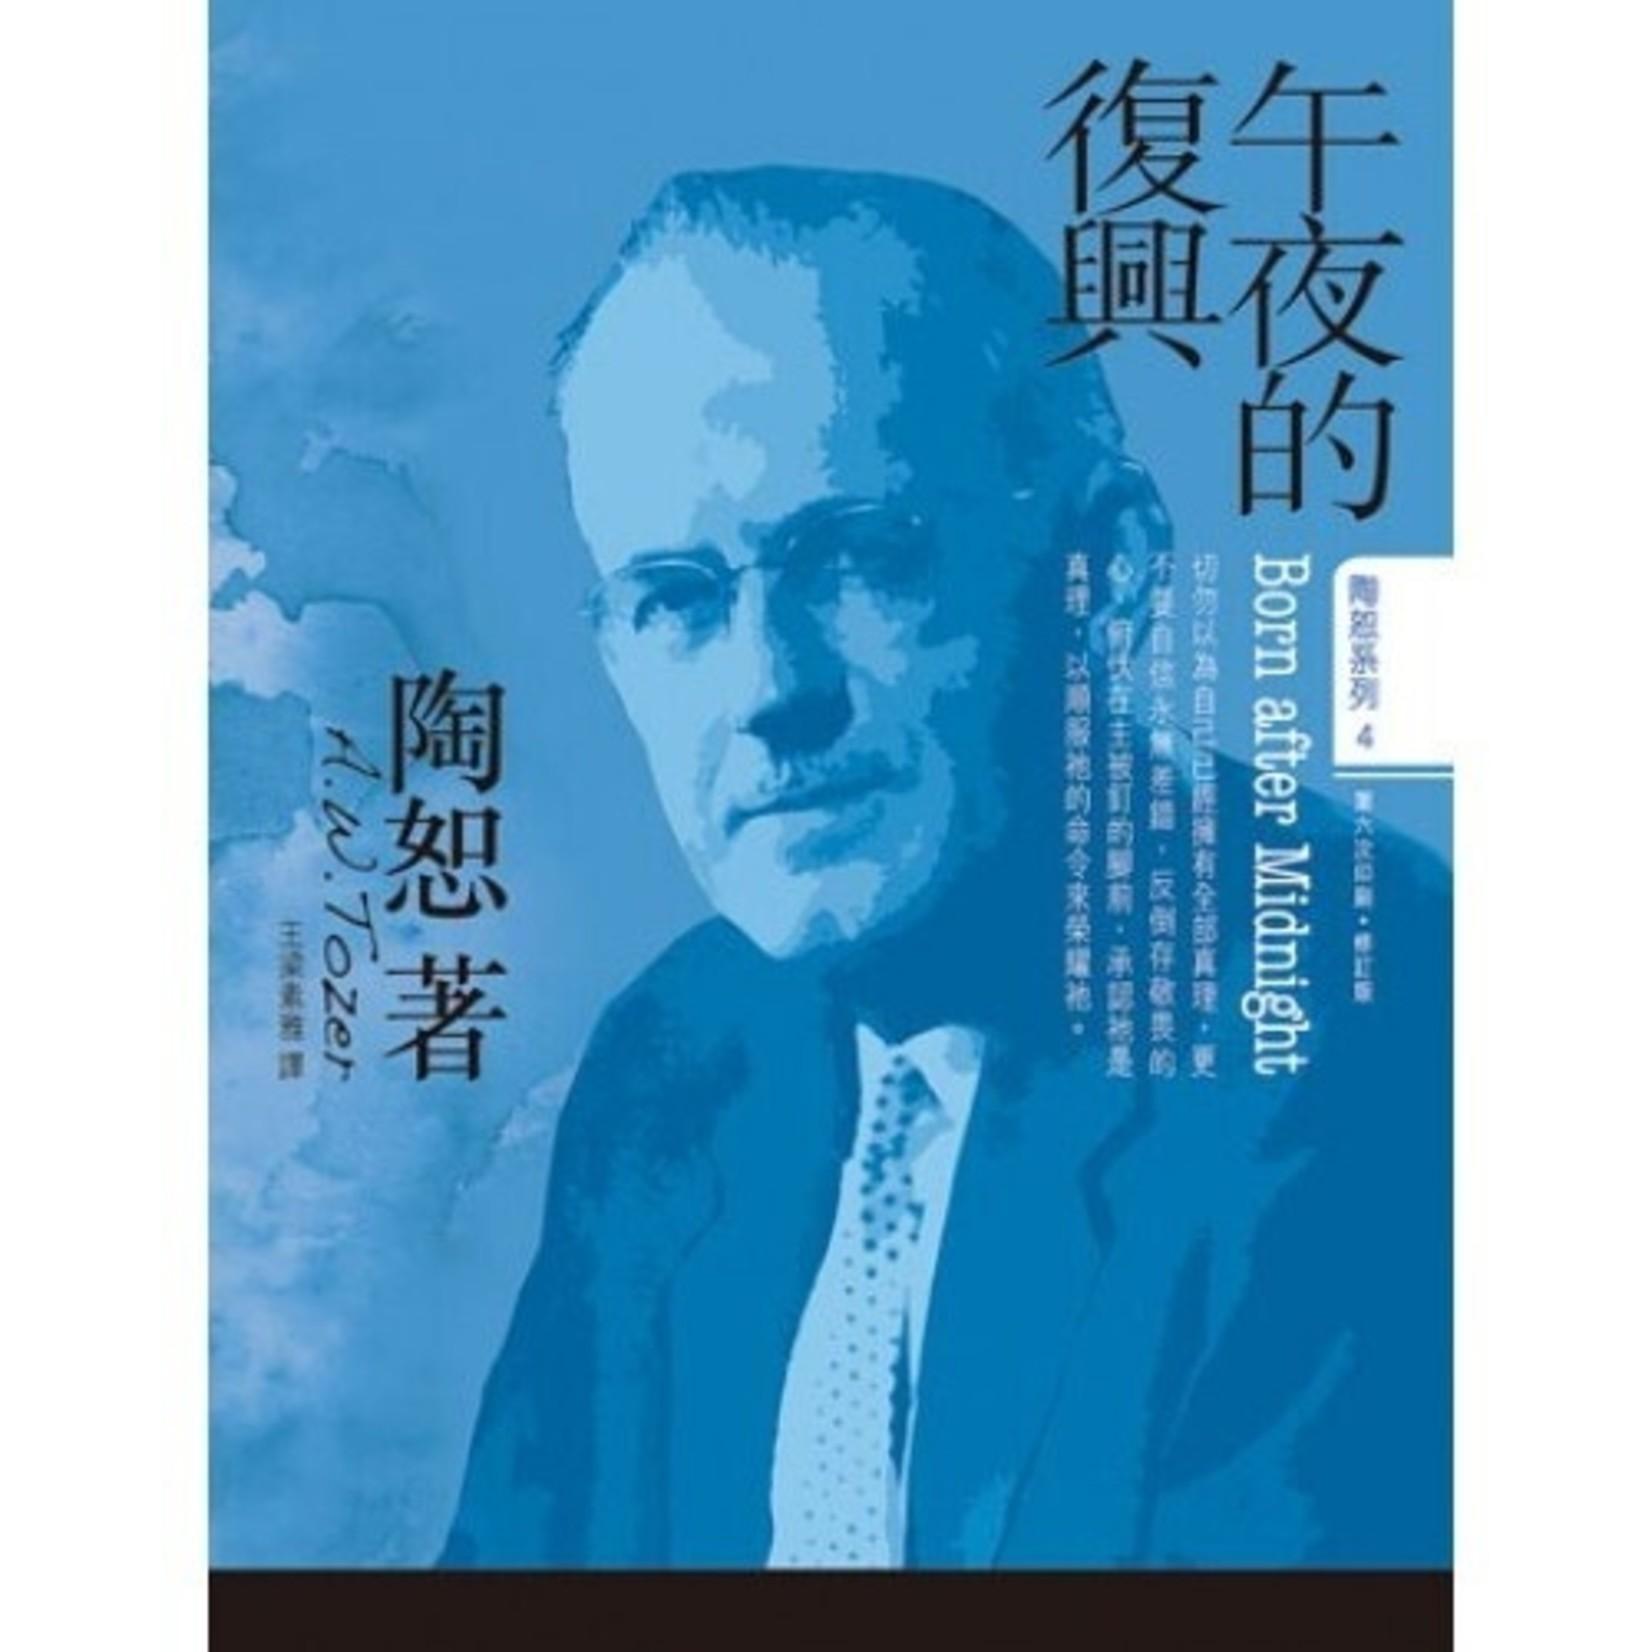 宣道 China Alliance Press 陶恕系列04:午夜的復興  Born after Midnight